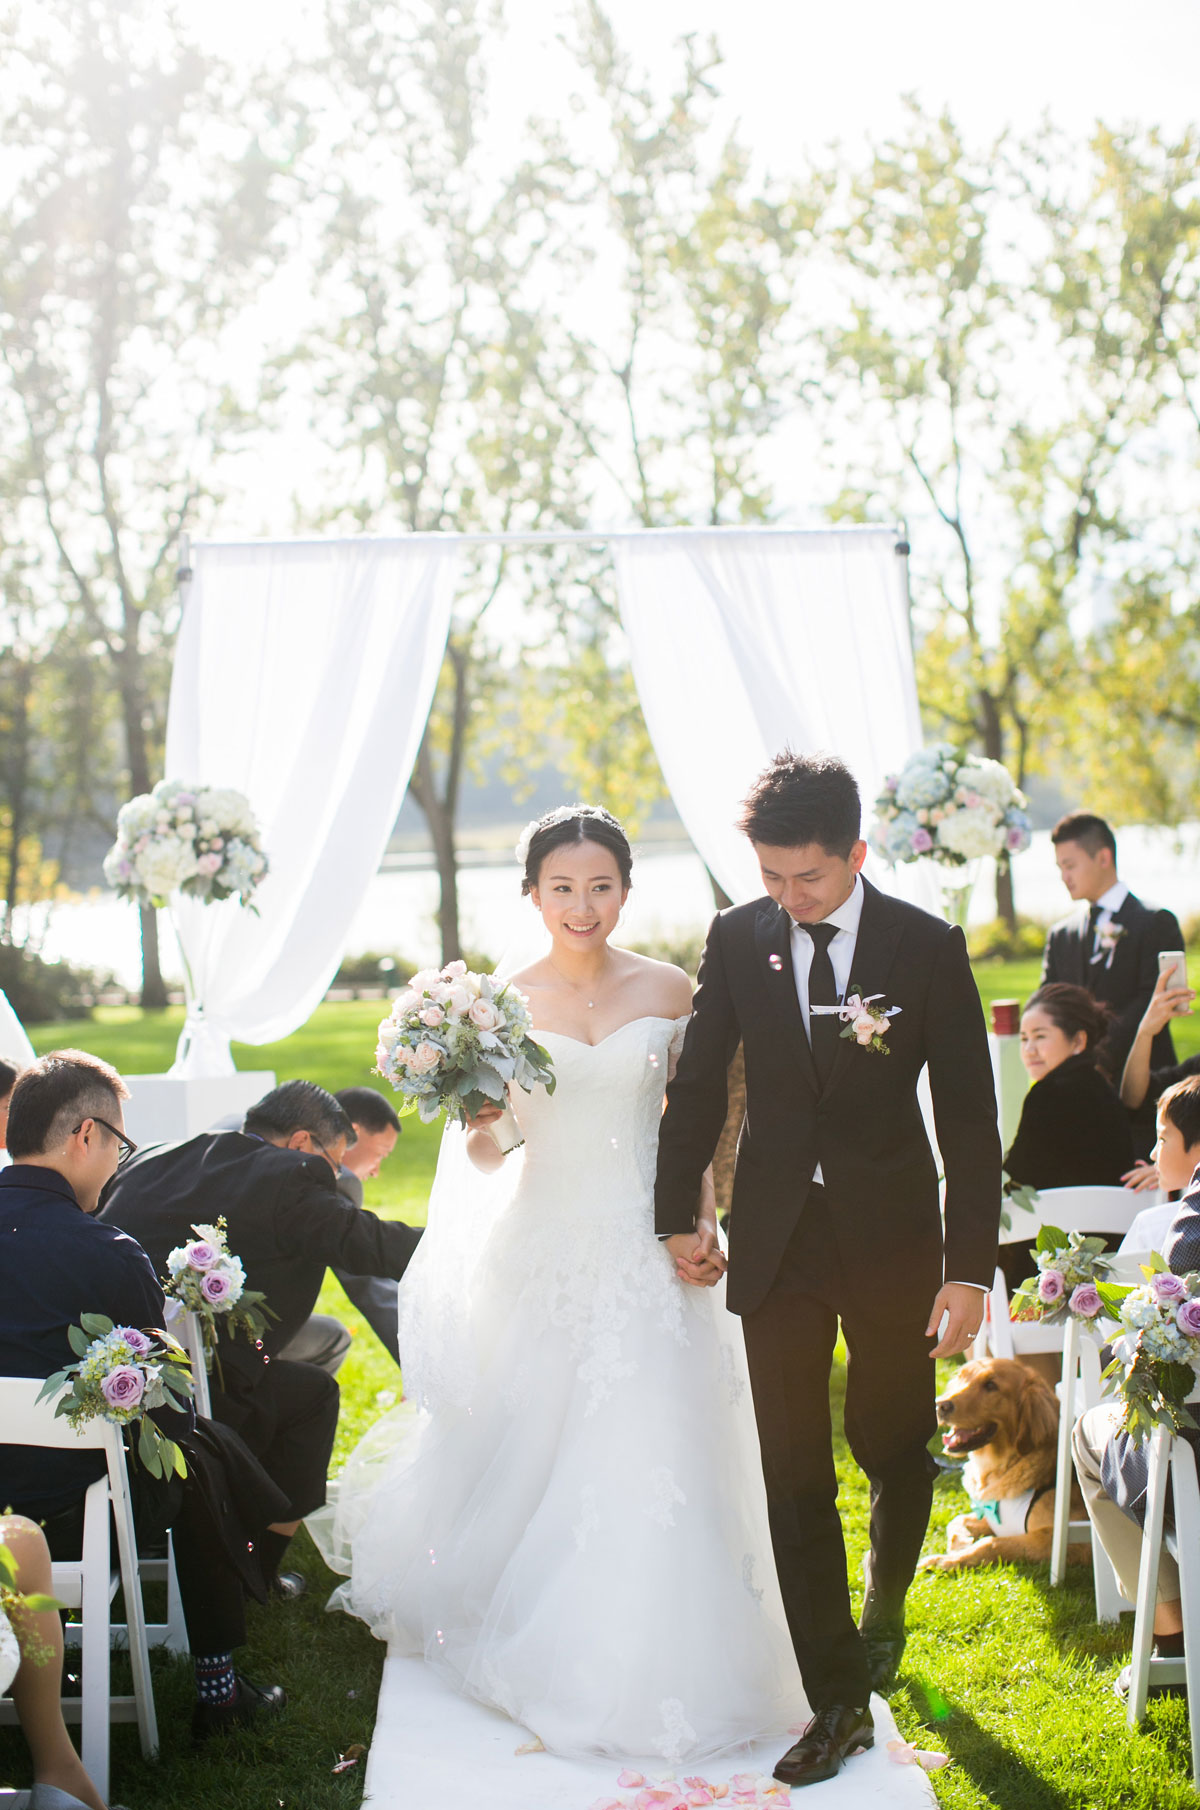 dloveaffair_wedding_ceremony_walk_aisle_bride_groom.jpg